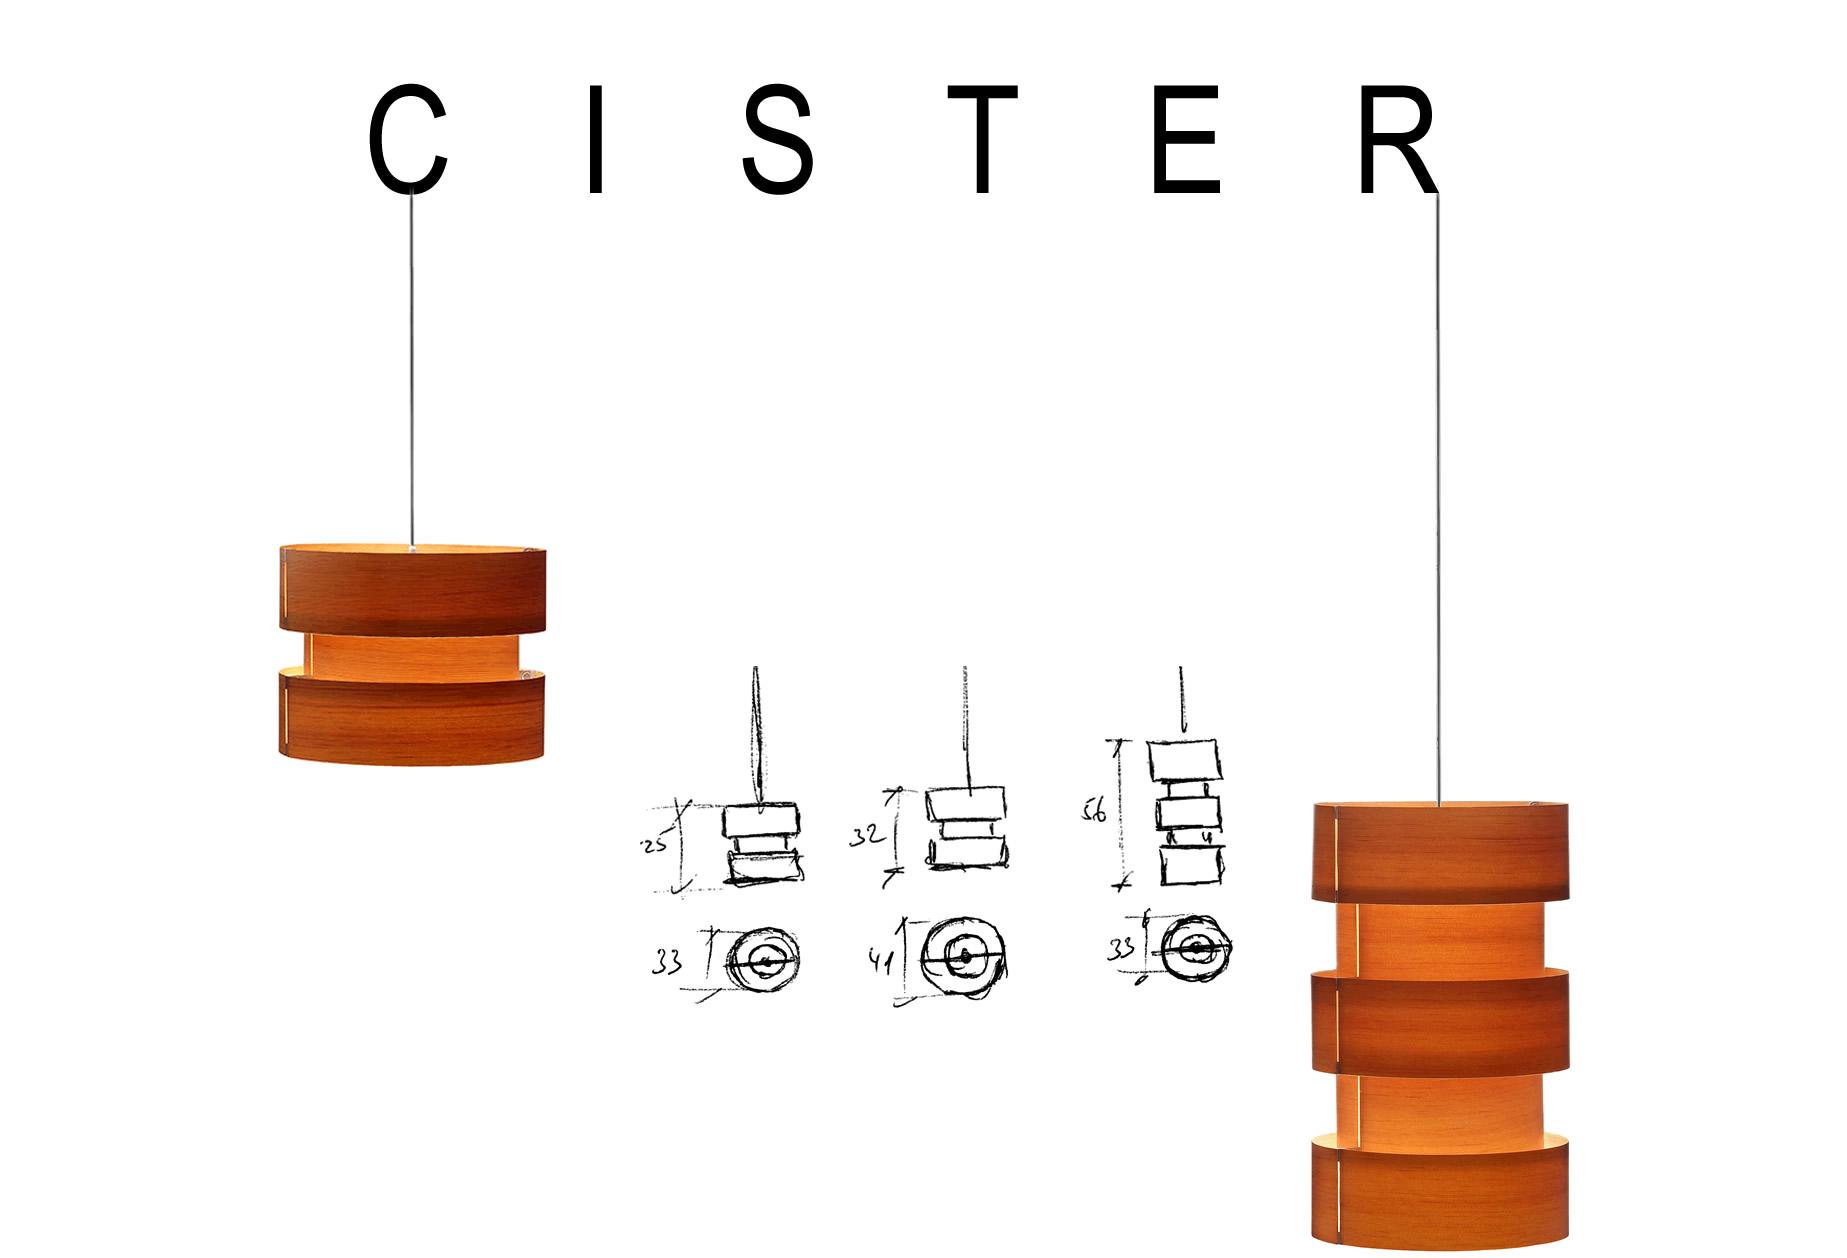 CISTER - Coderch - Portfolio TUNDS